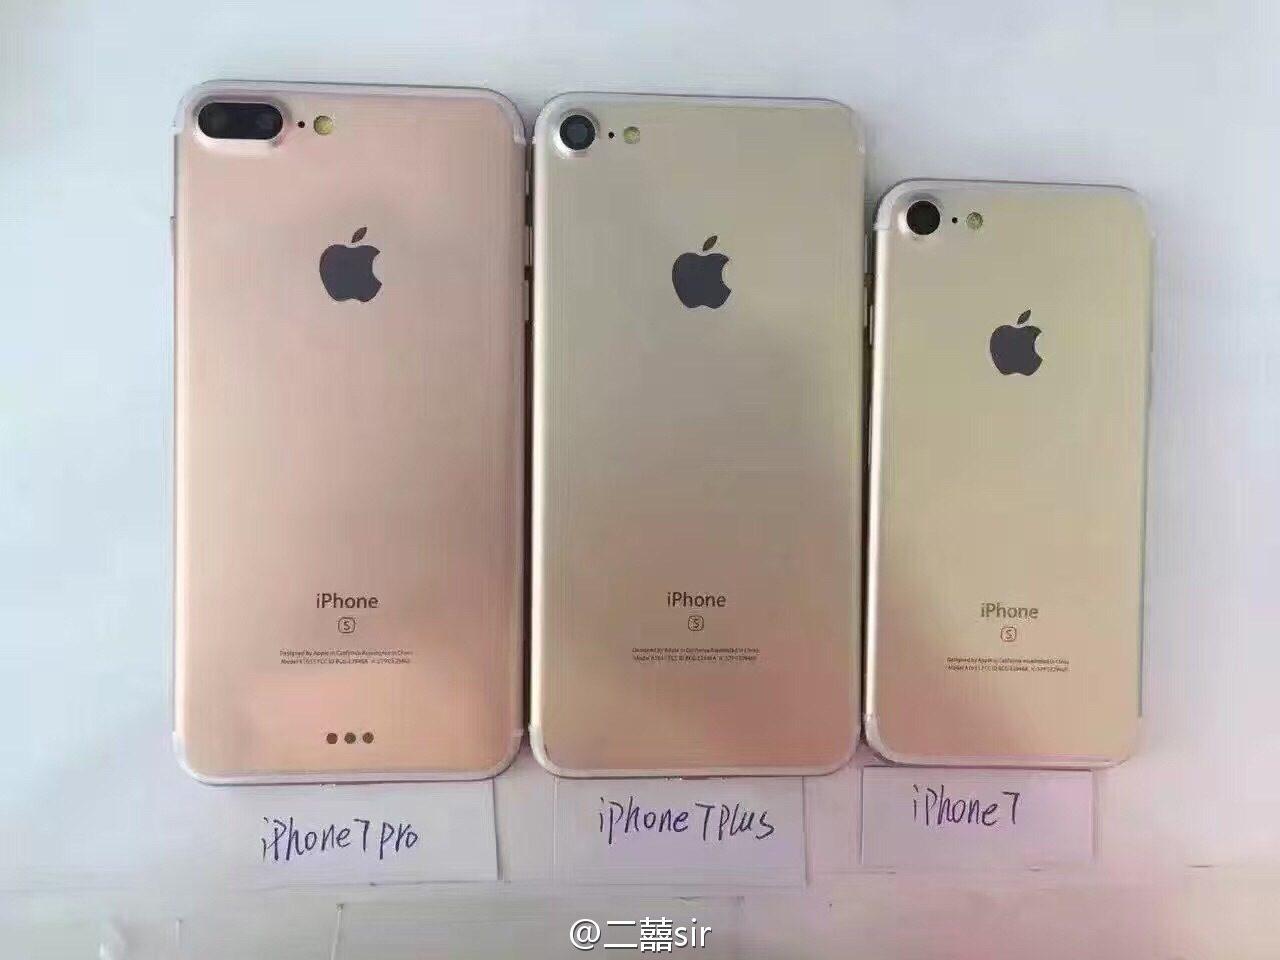 iphone_7_iphone_7_plus_iphone_7_pro_back